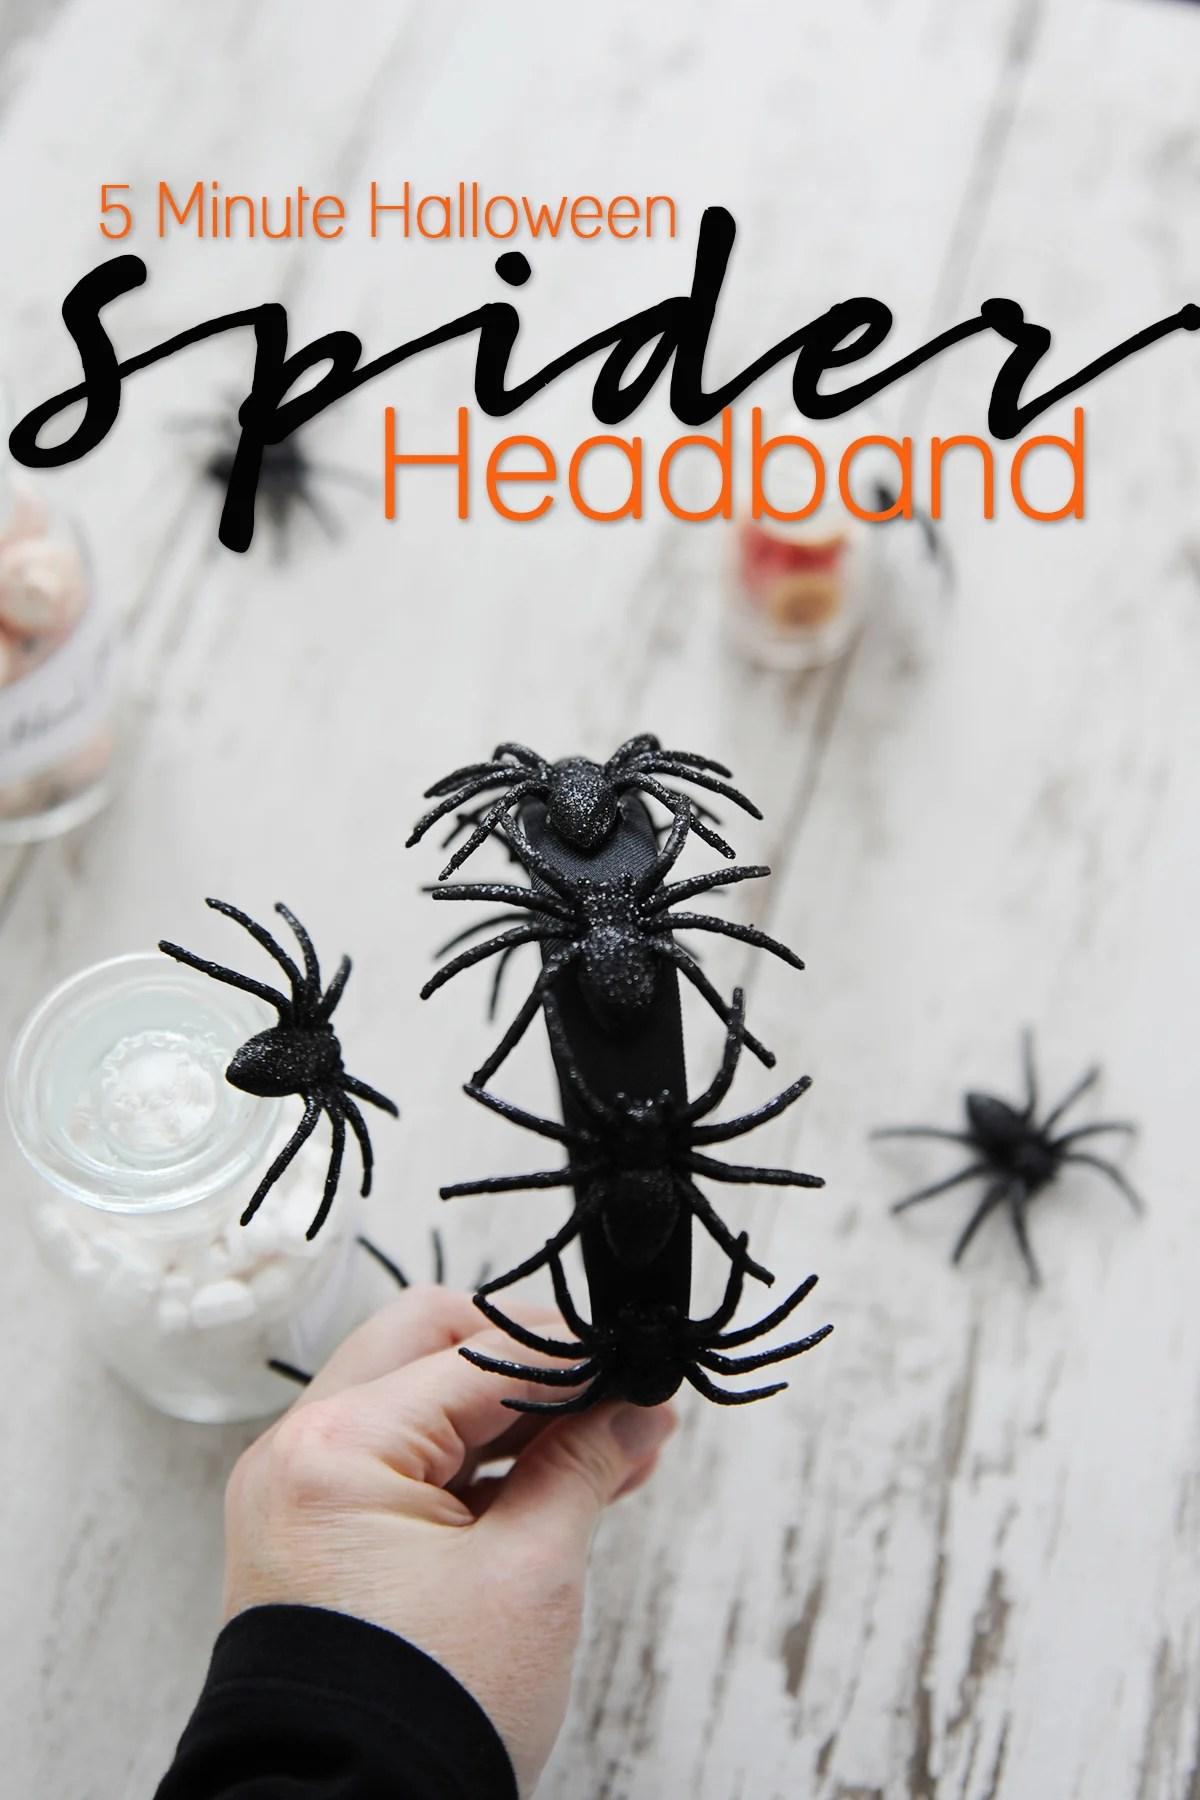 5 minute halloween spider headband diy